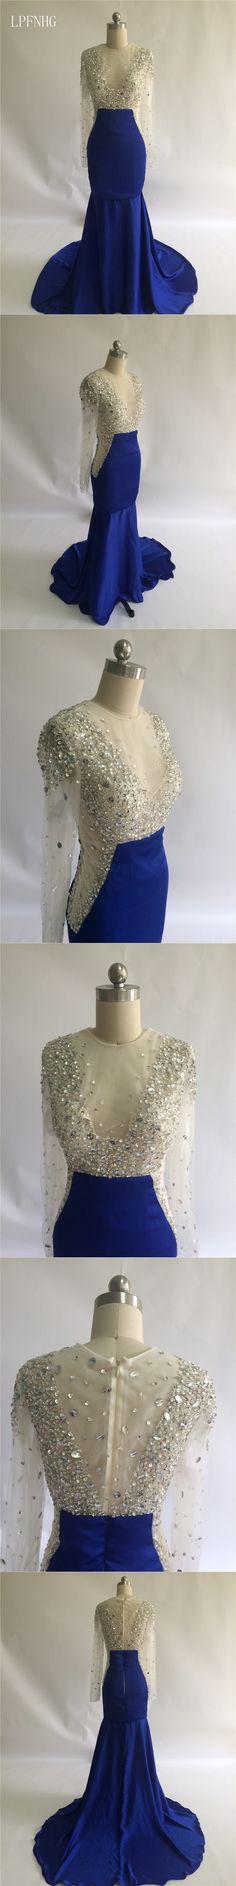 Vestido De Festa Mermaid Long Prom Dresses 2017 O-Neck Long Sleeve Zipper Sweep Train Satin and Tulle Crystal Sexy Evening Dress